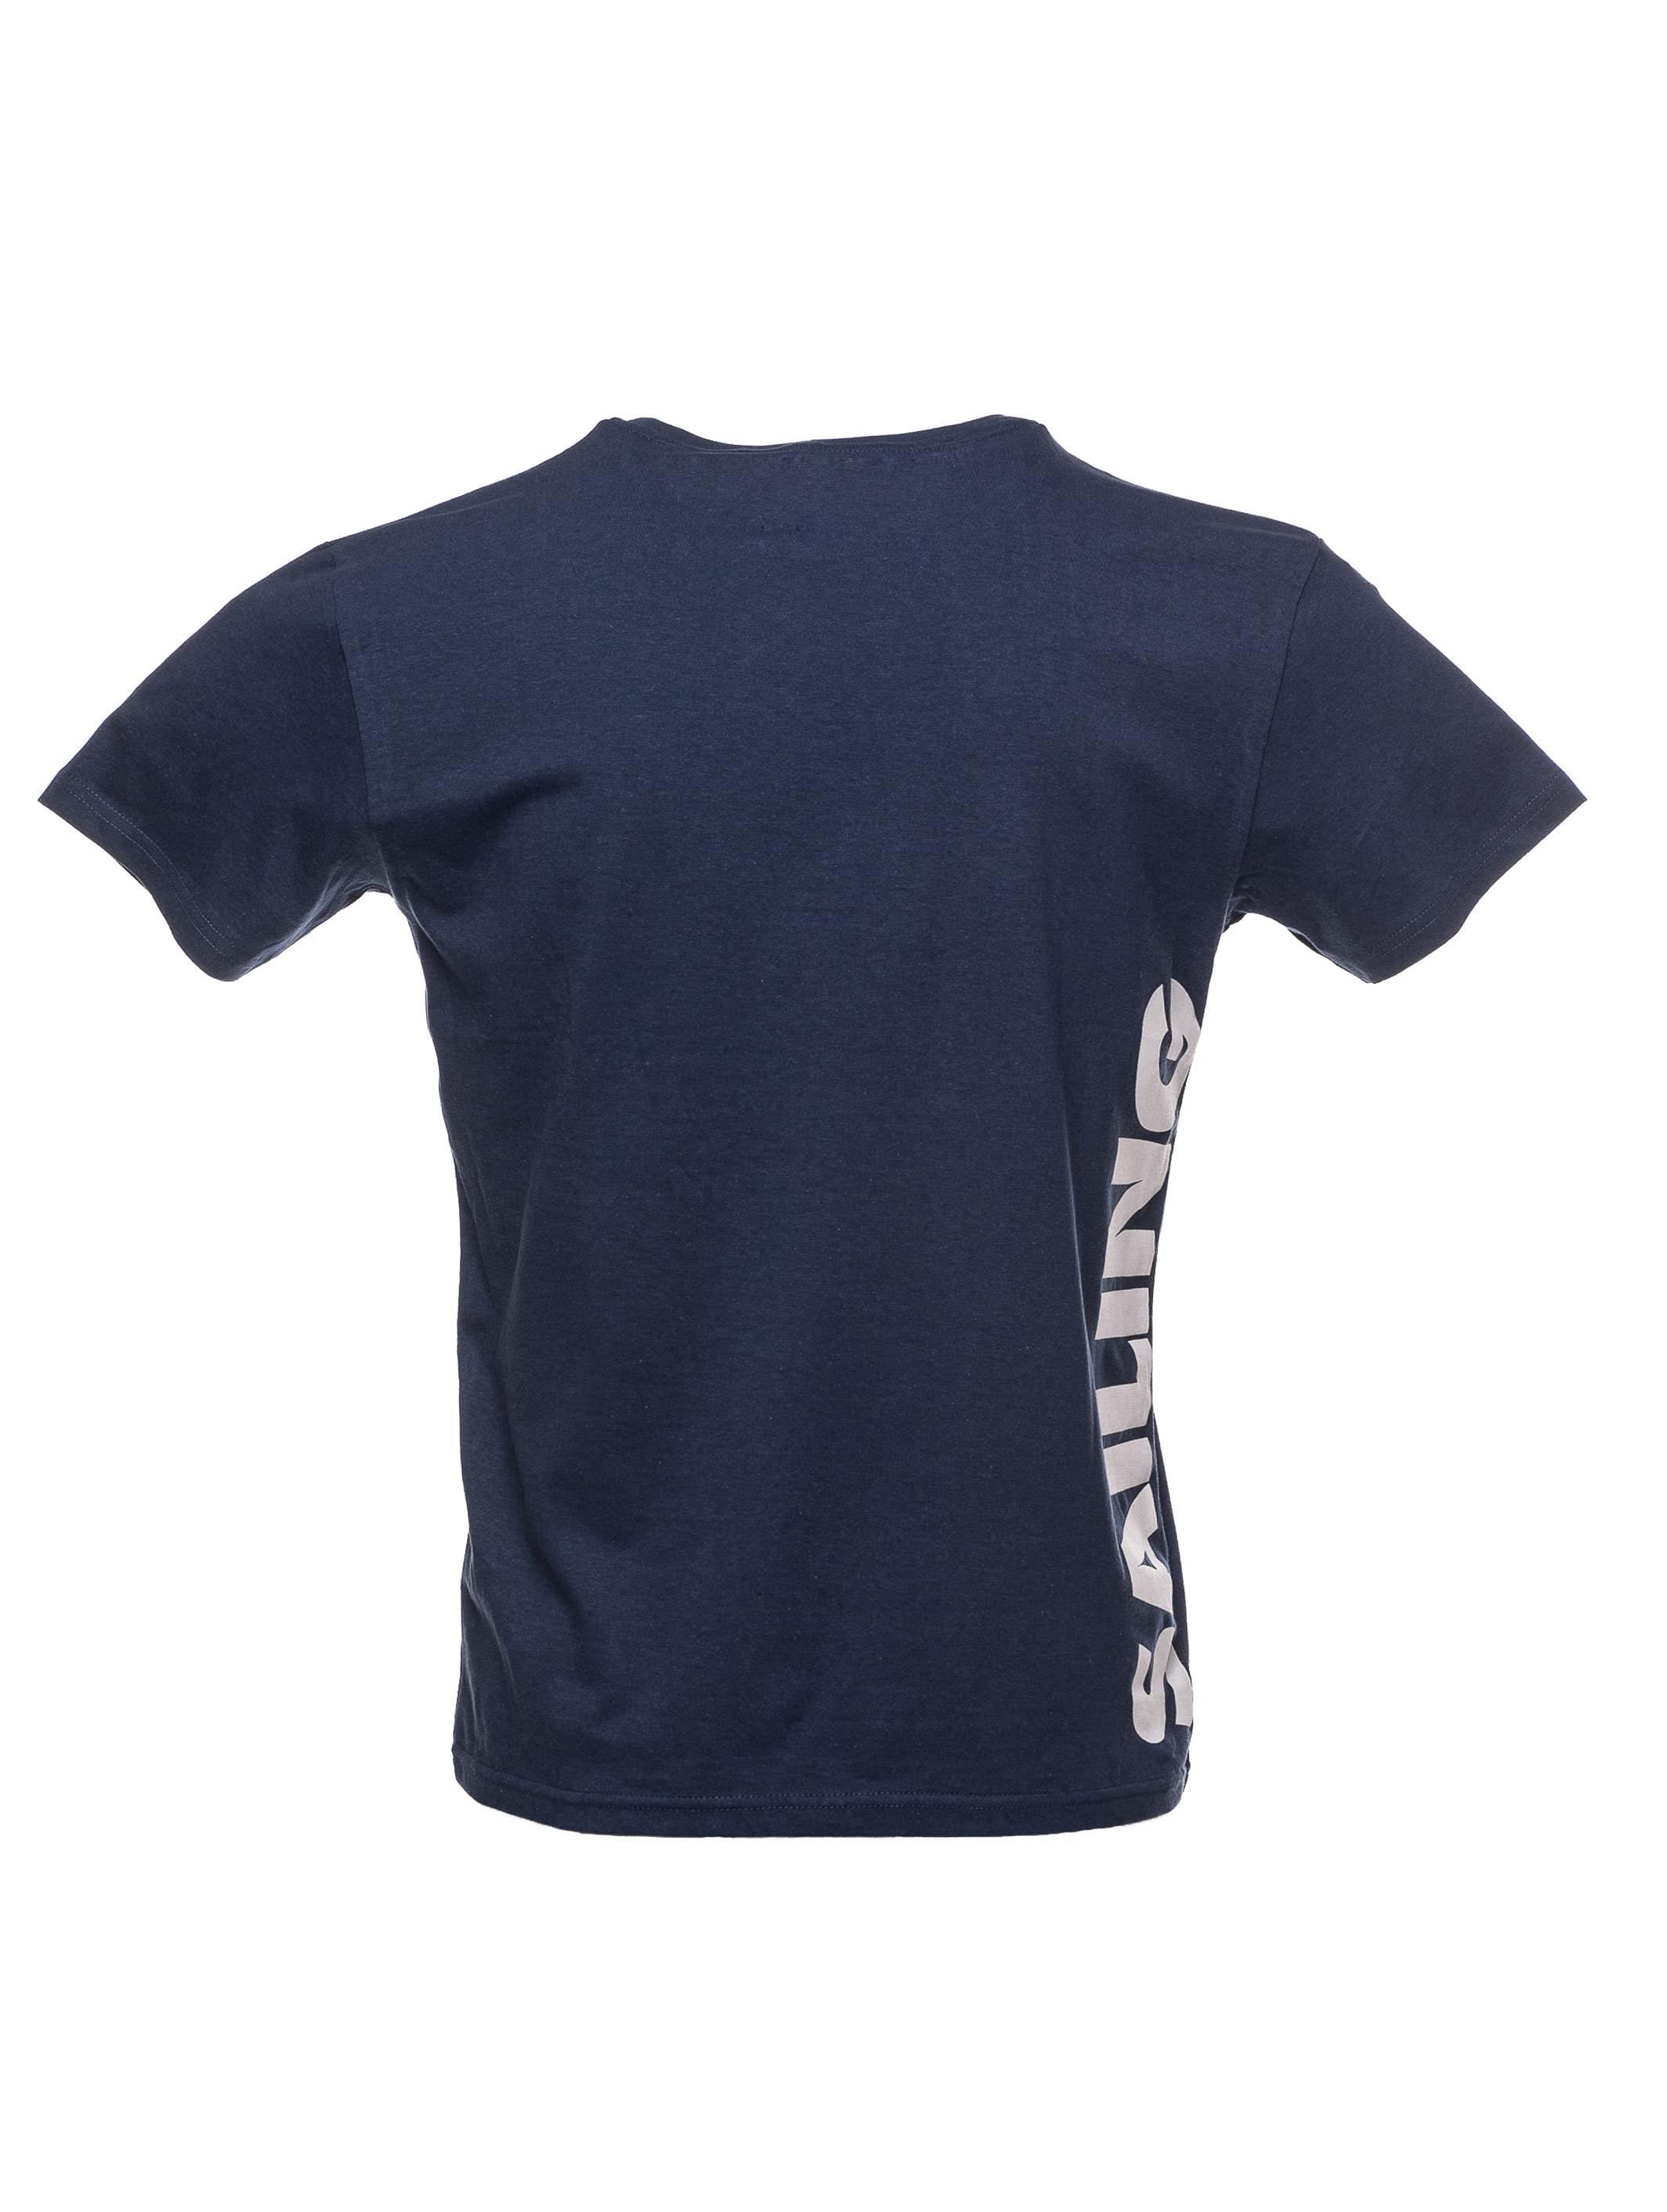 Dorko SAILING Rővid ujjú T Shirt Rővid ujjú T Shirt